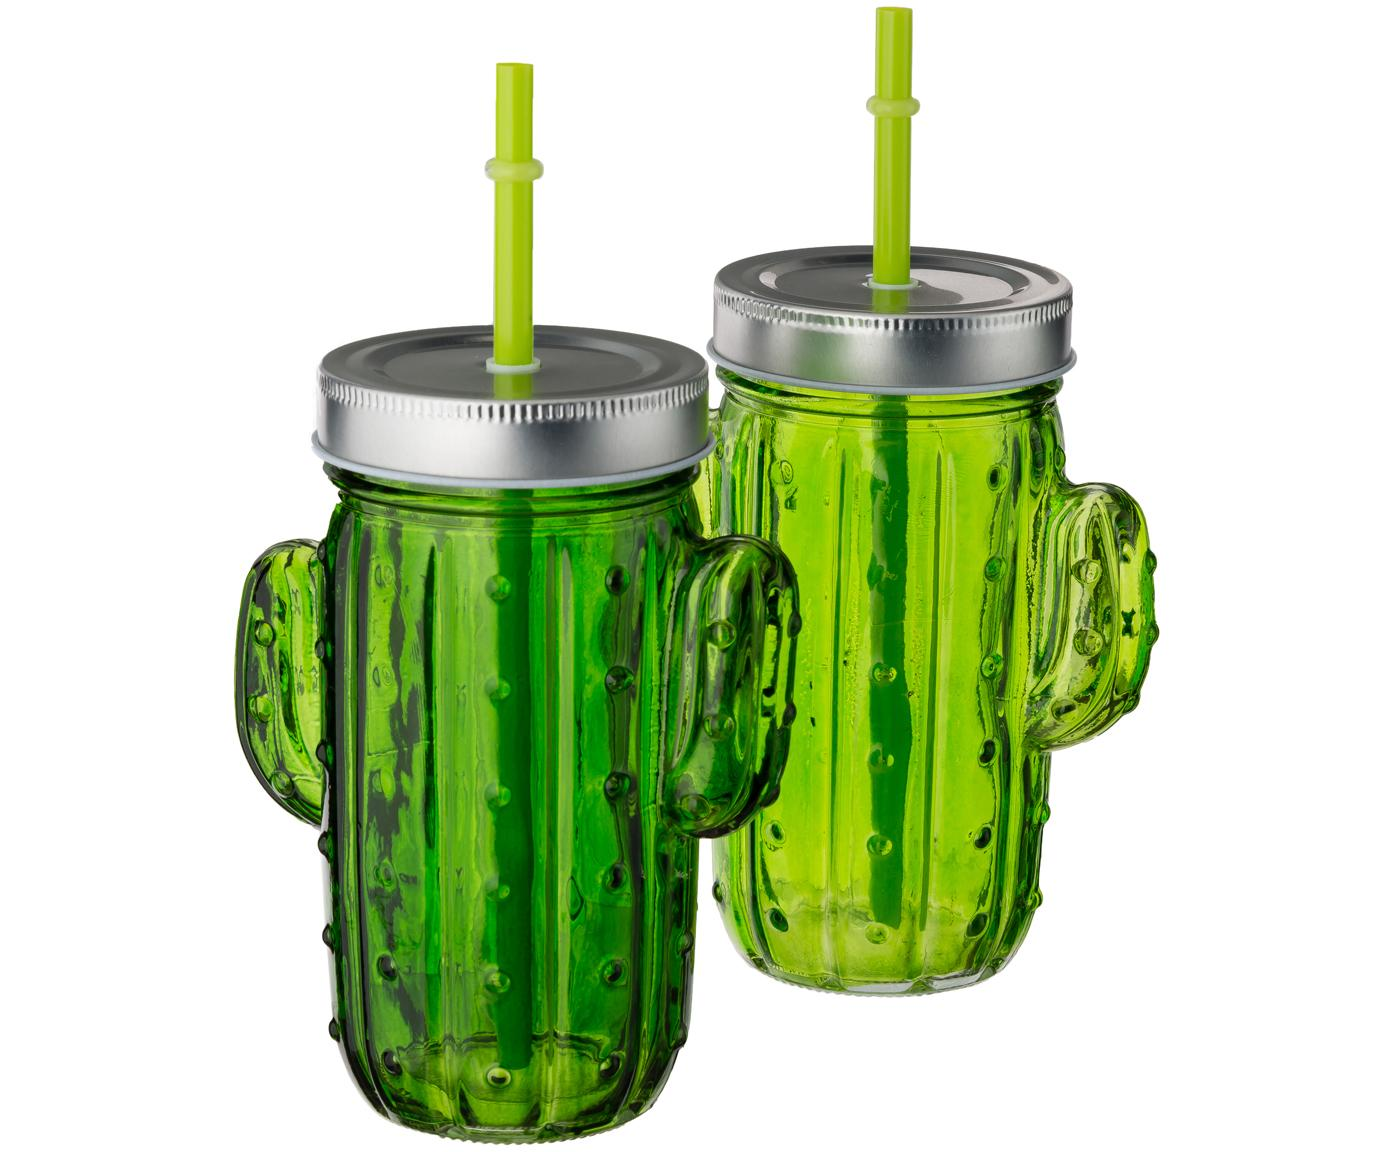 Set bicchieri con cannuccia  Kaktus, 2 pz., Coperchio: metallo, Toni verdi, L 12 x A 15 cm